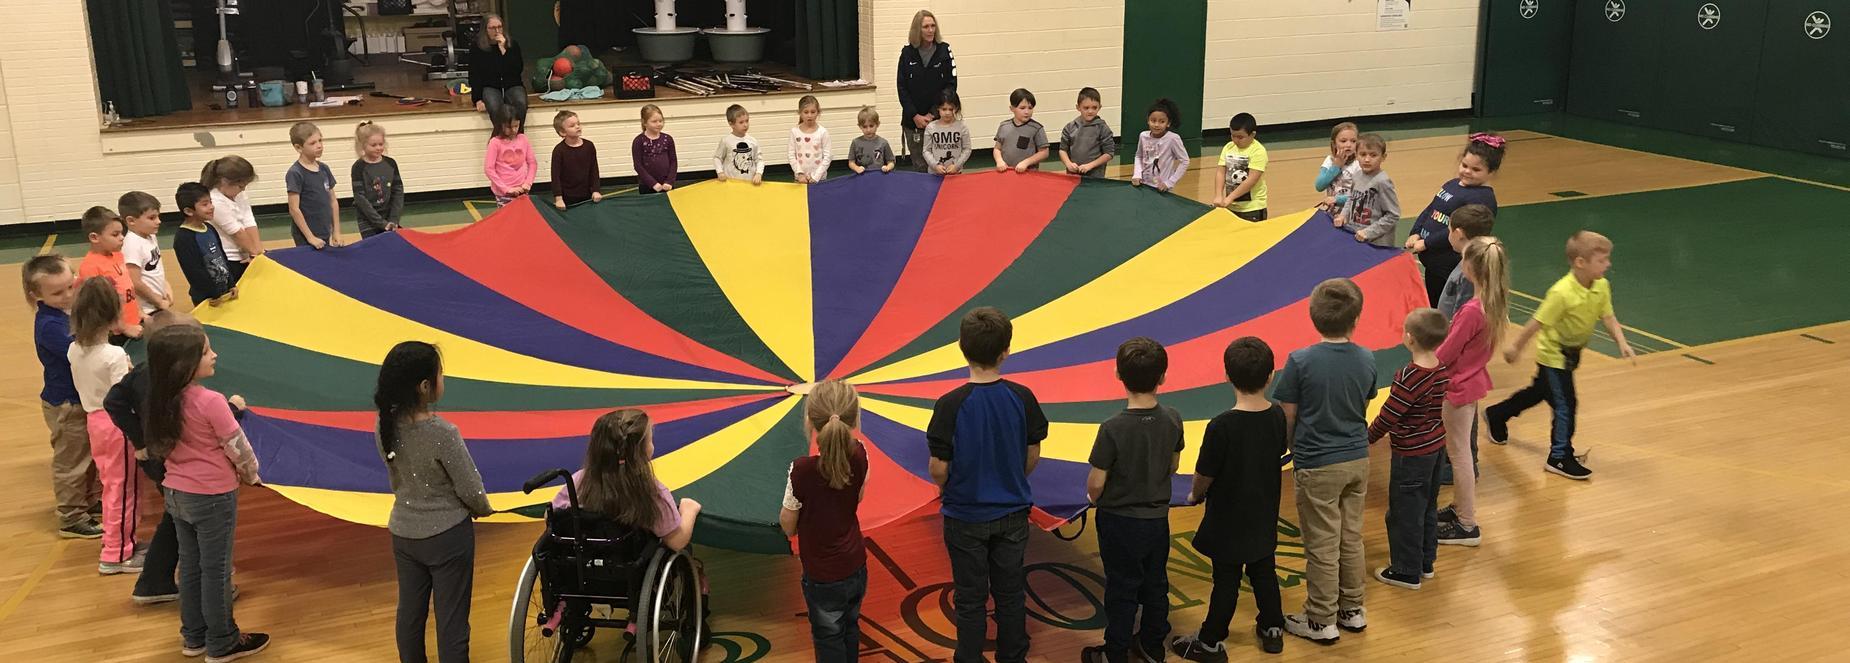 Parachute - 1st Grade